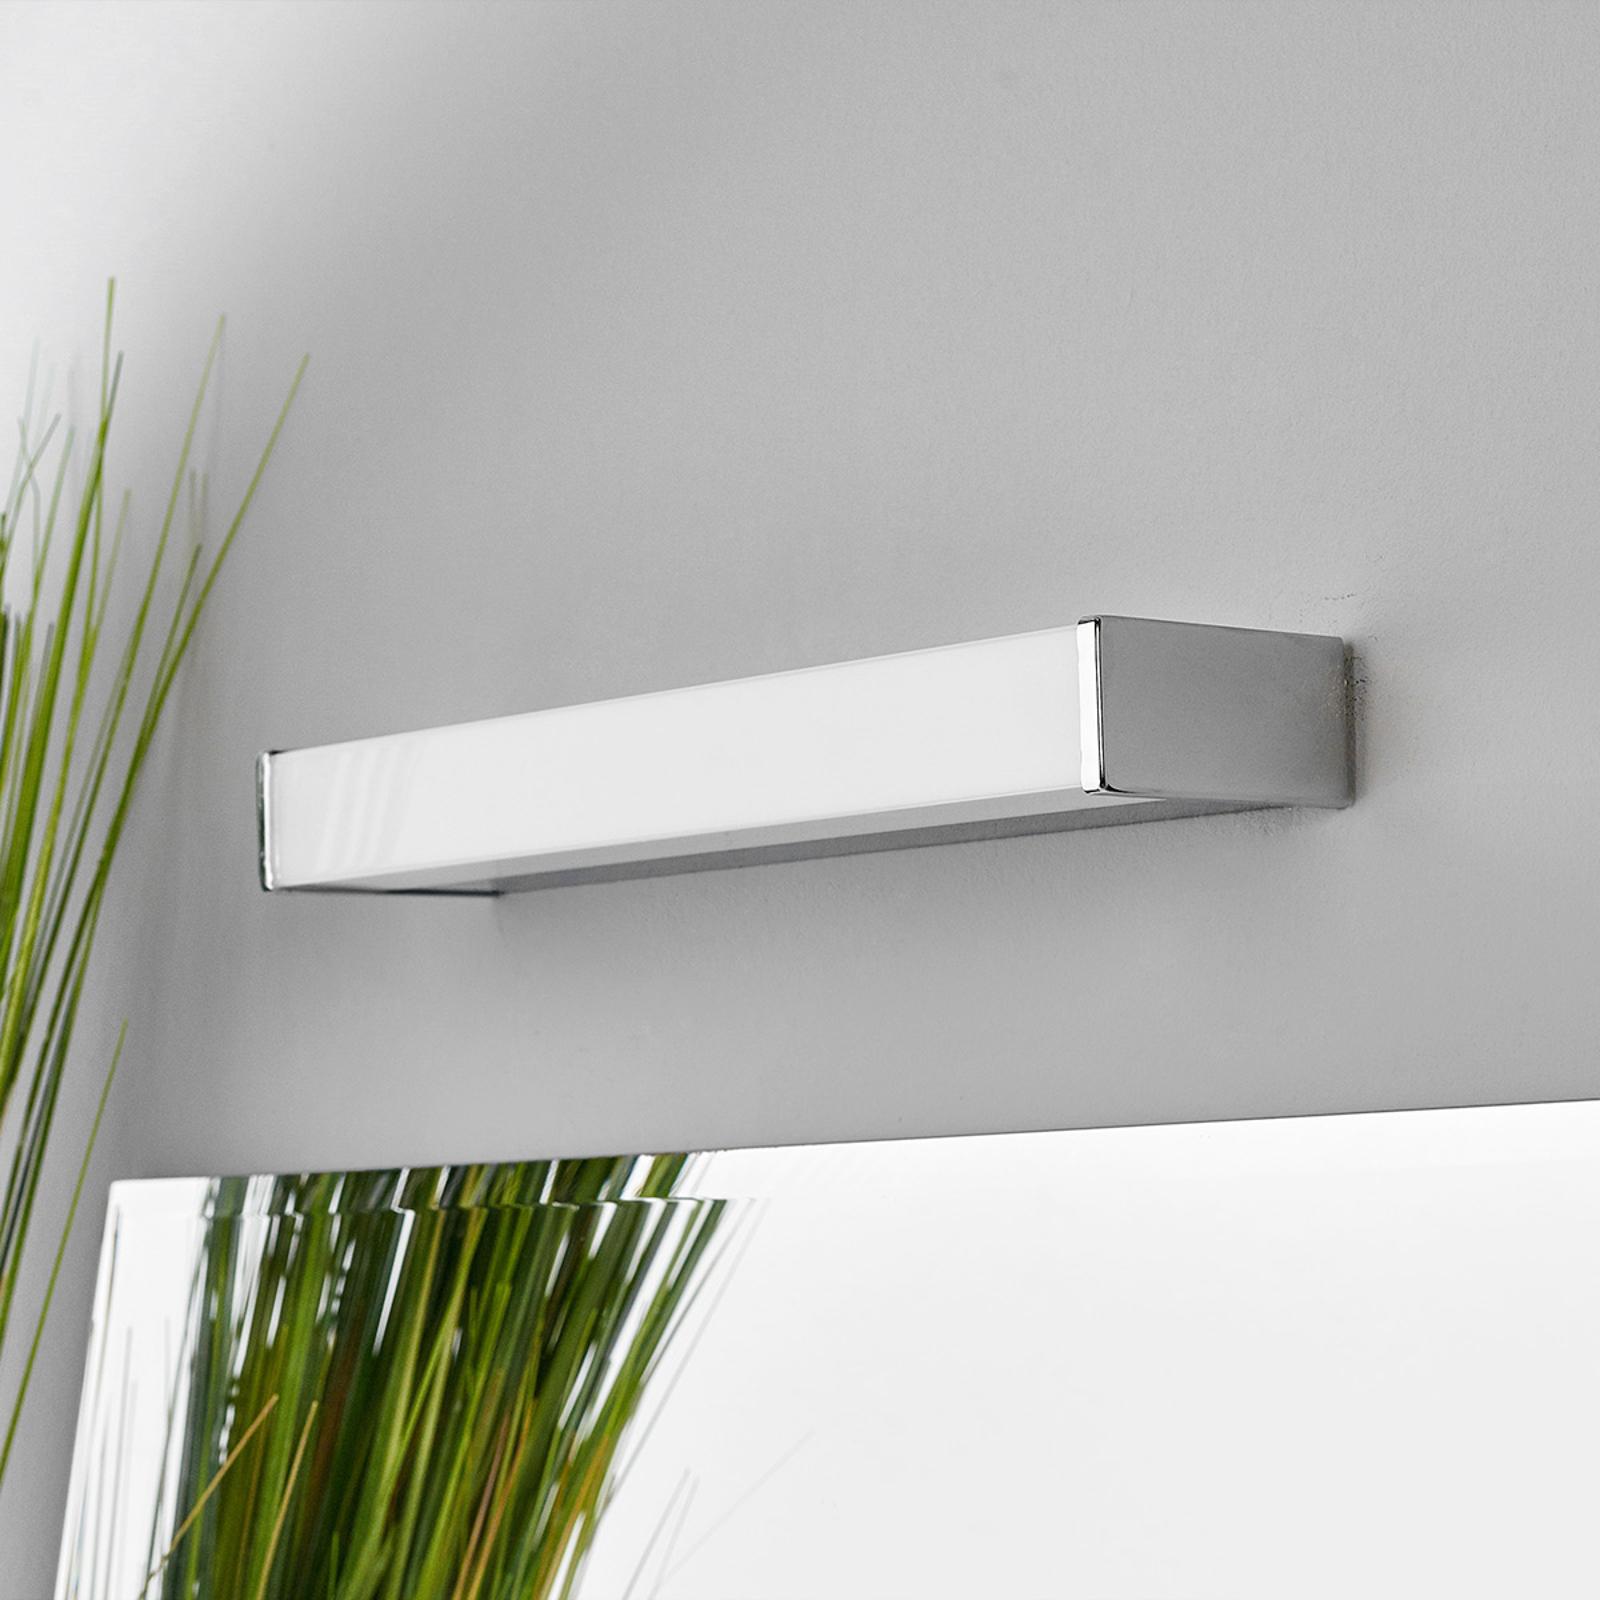 Applique miroir bain LED Philippa angulaire 32cm